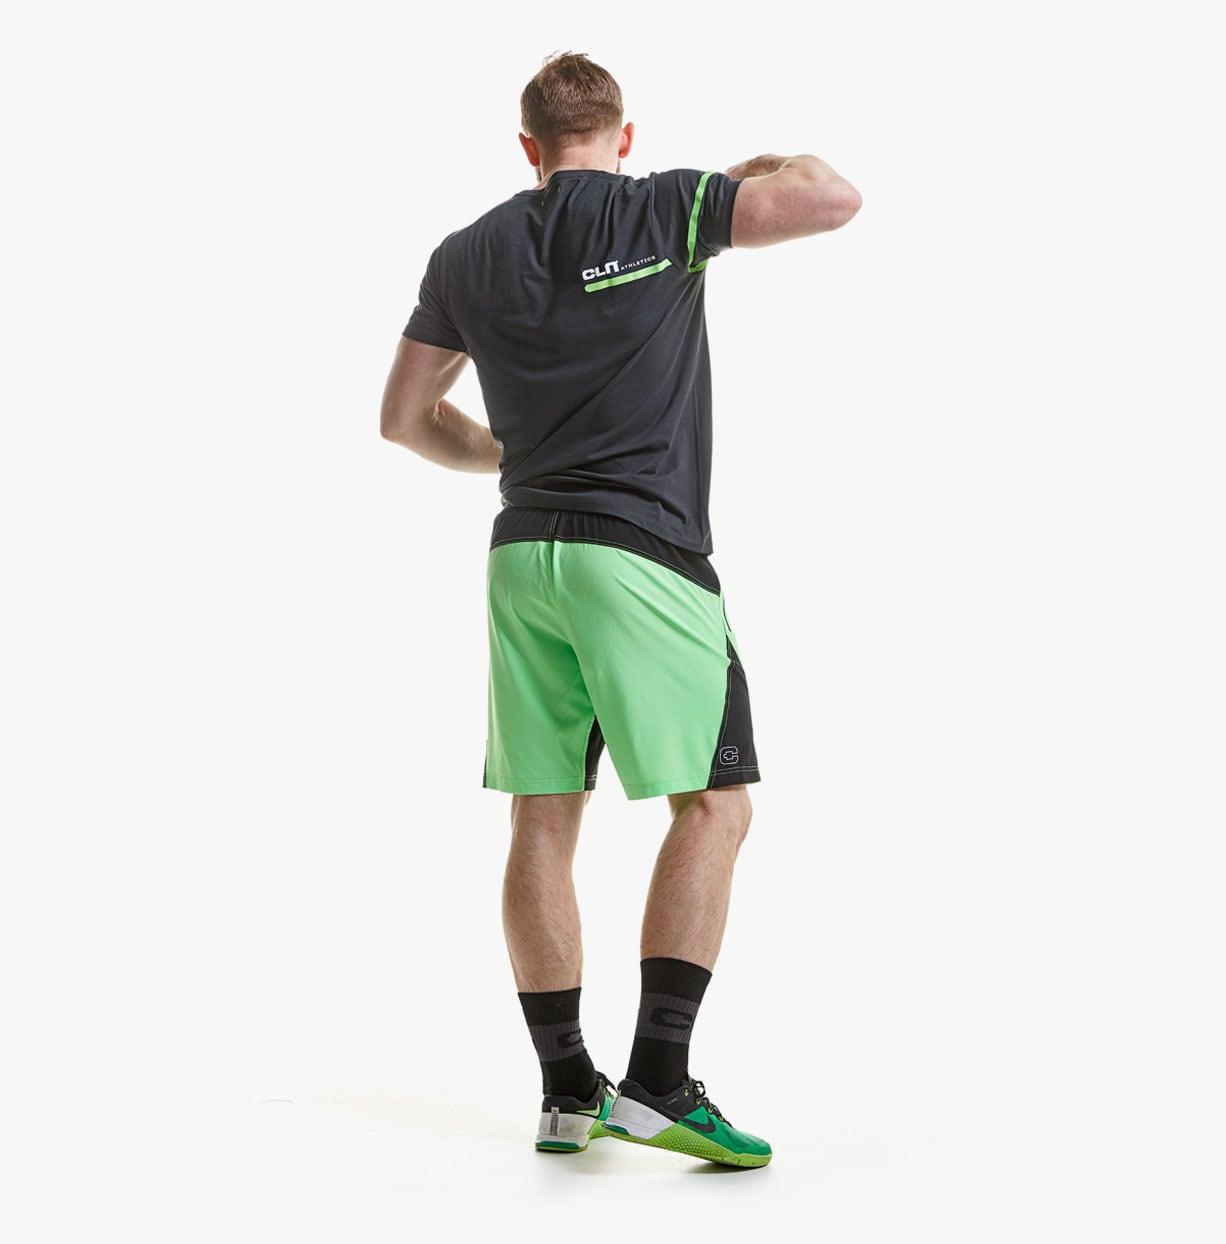 CLN-Injection-Shorts---Acid-green-3